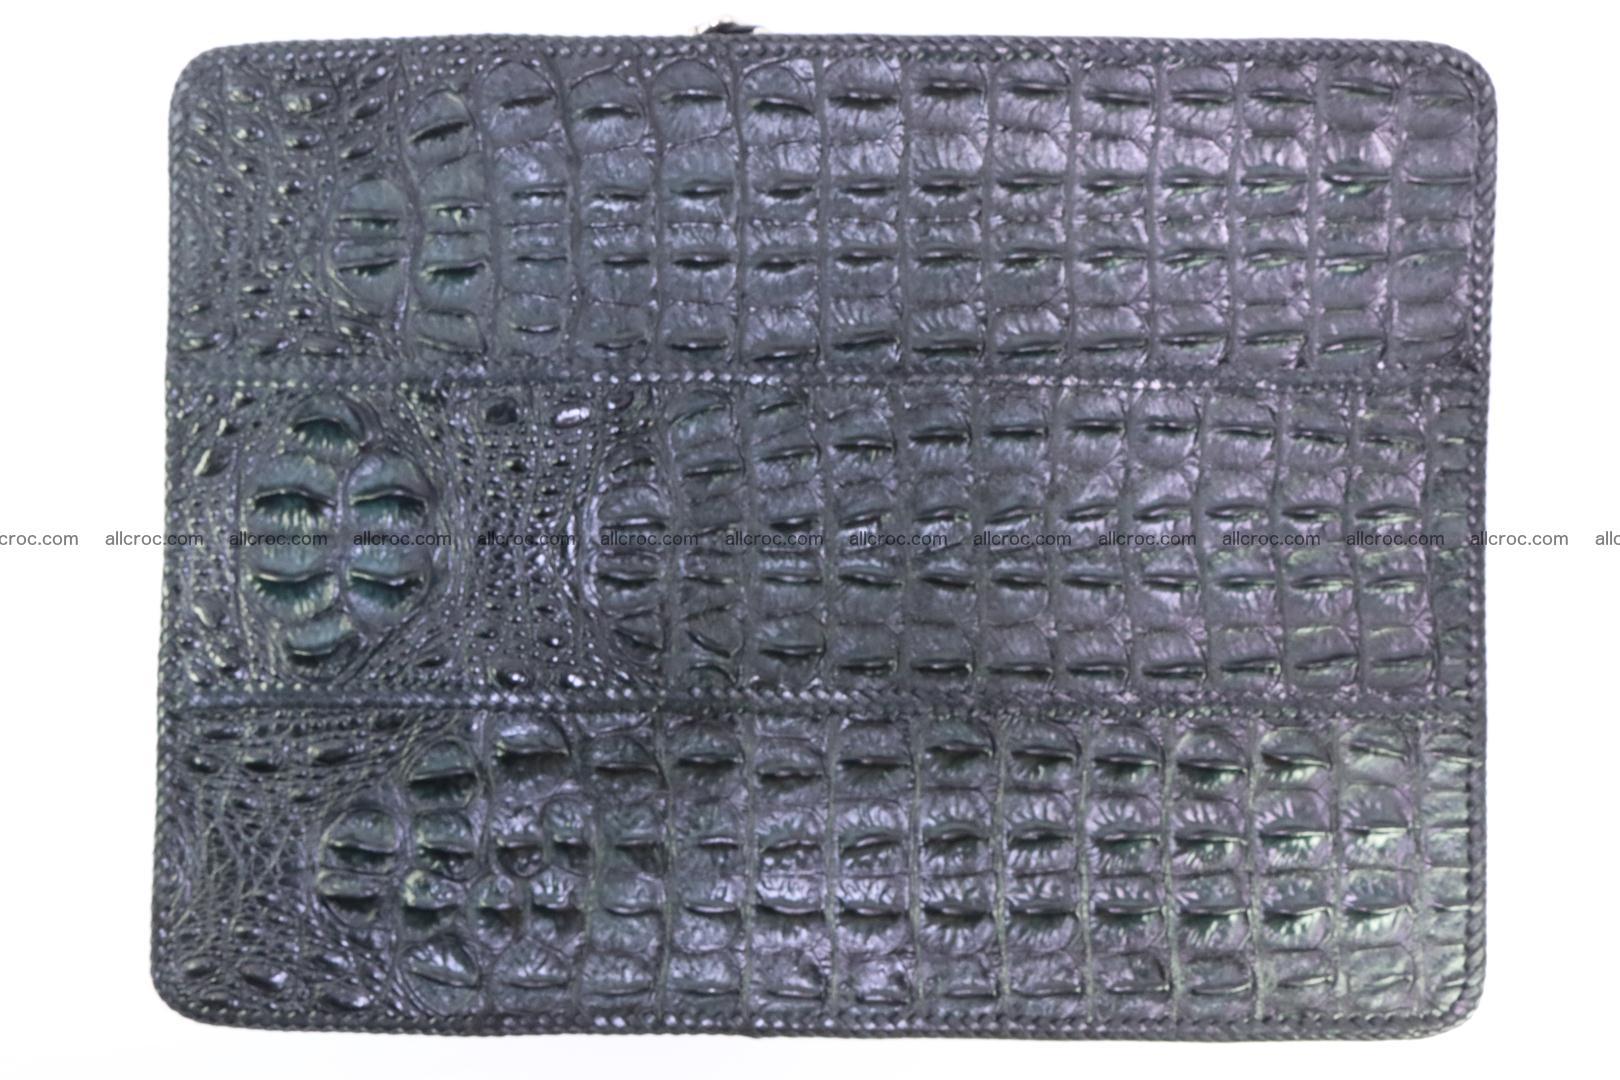 Crocodile skin shoulder bag with braided edges 147 Foto 12